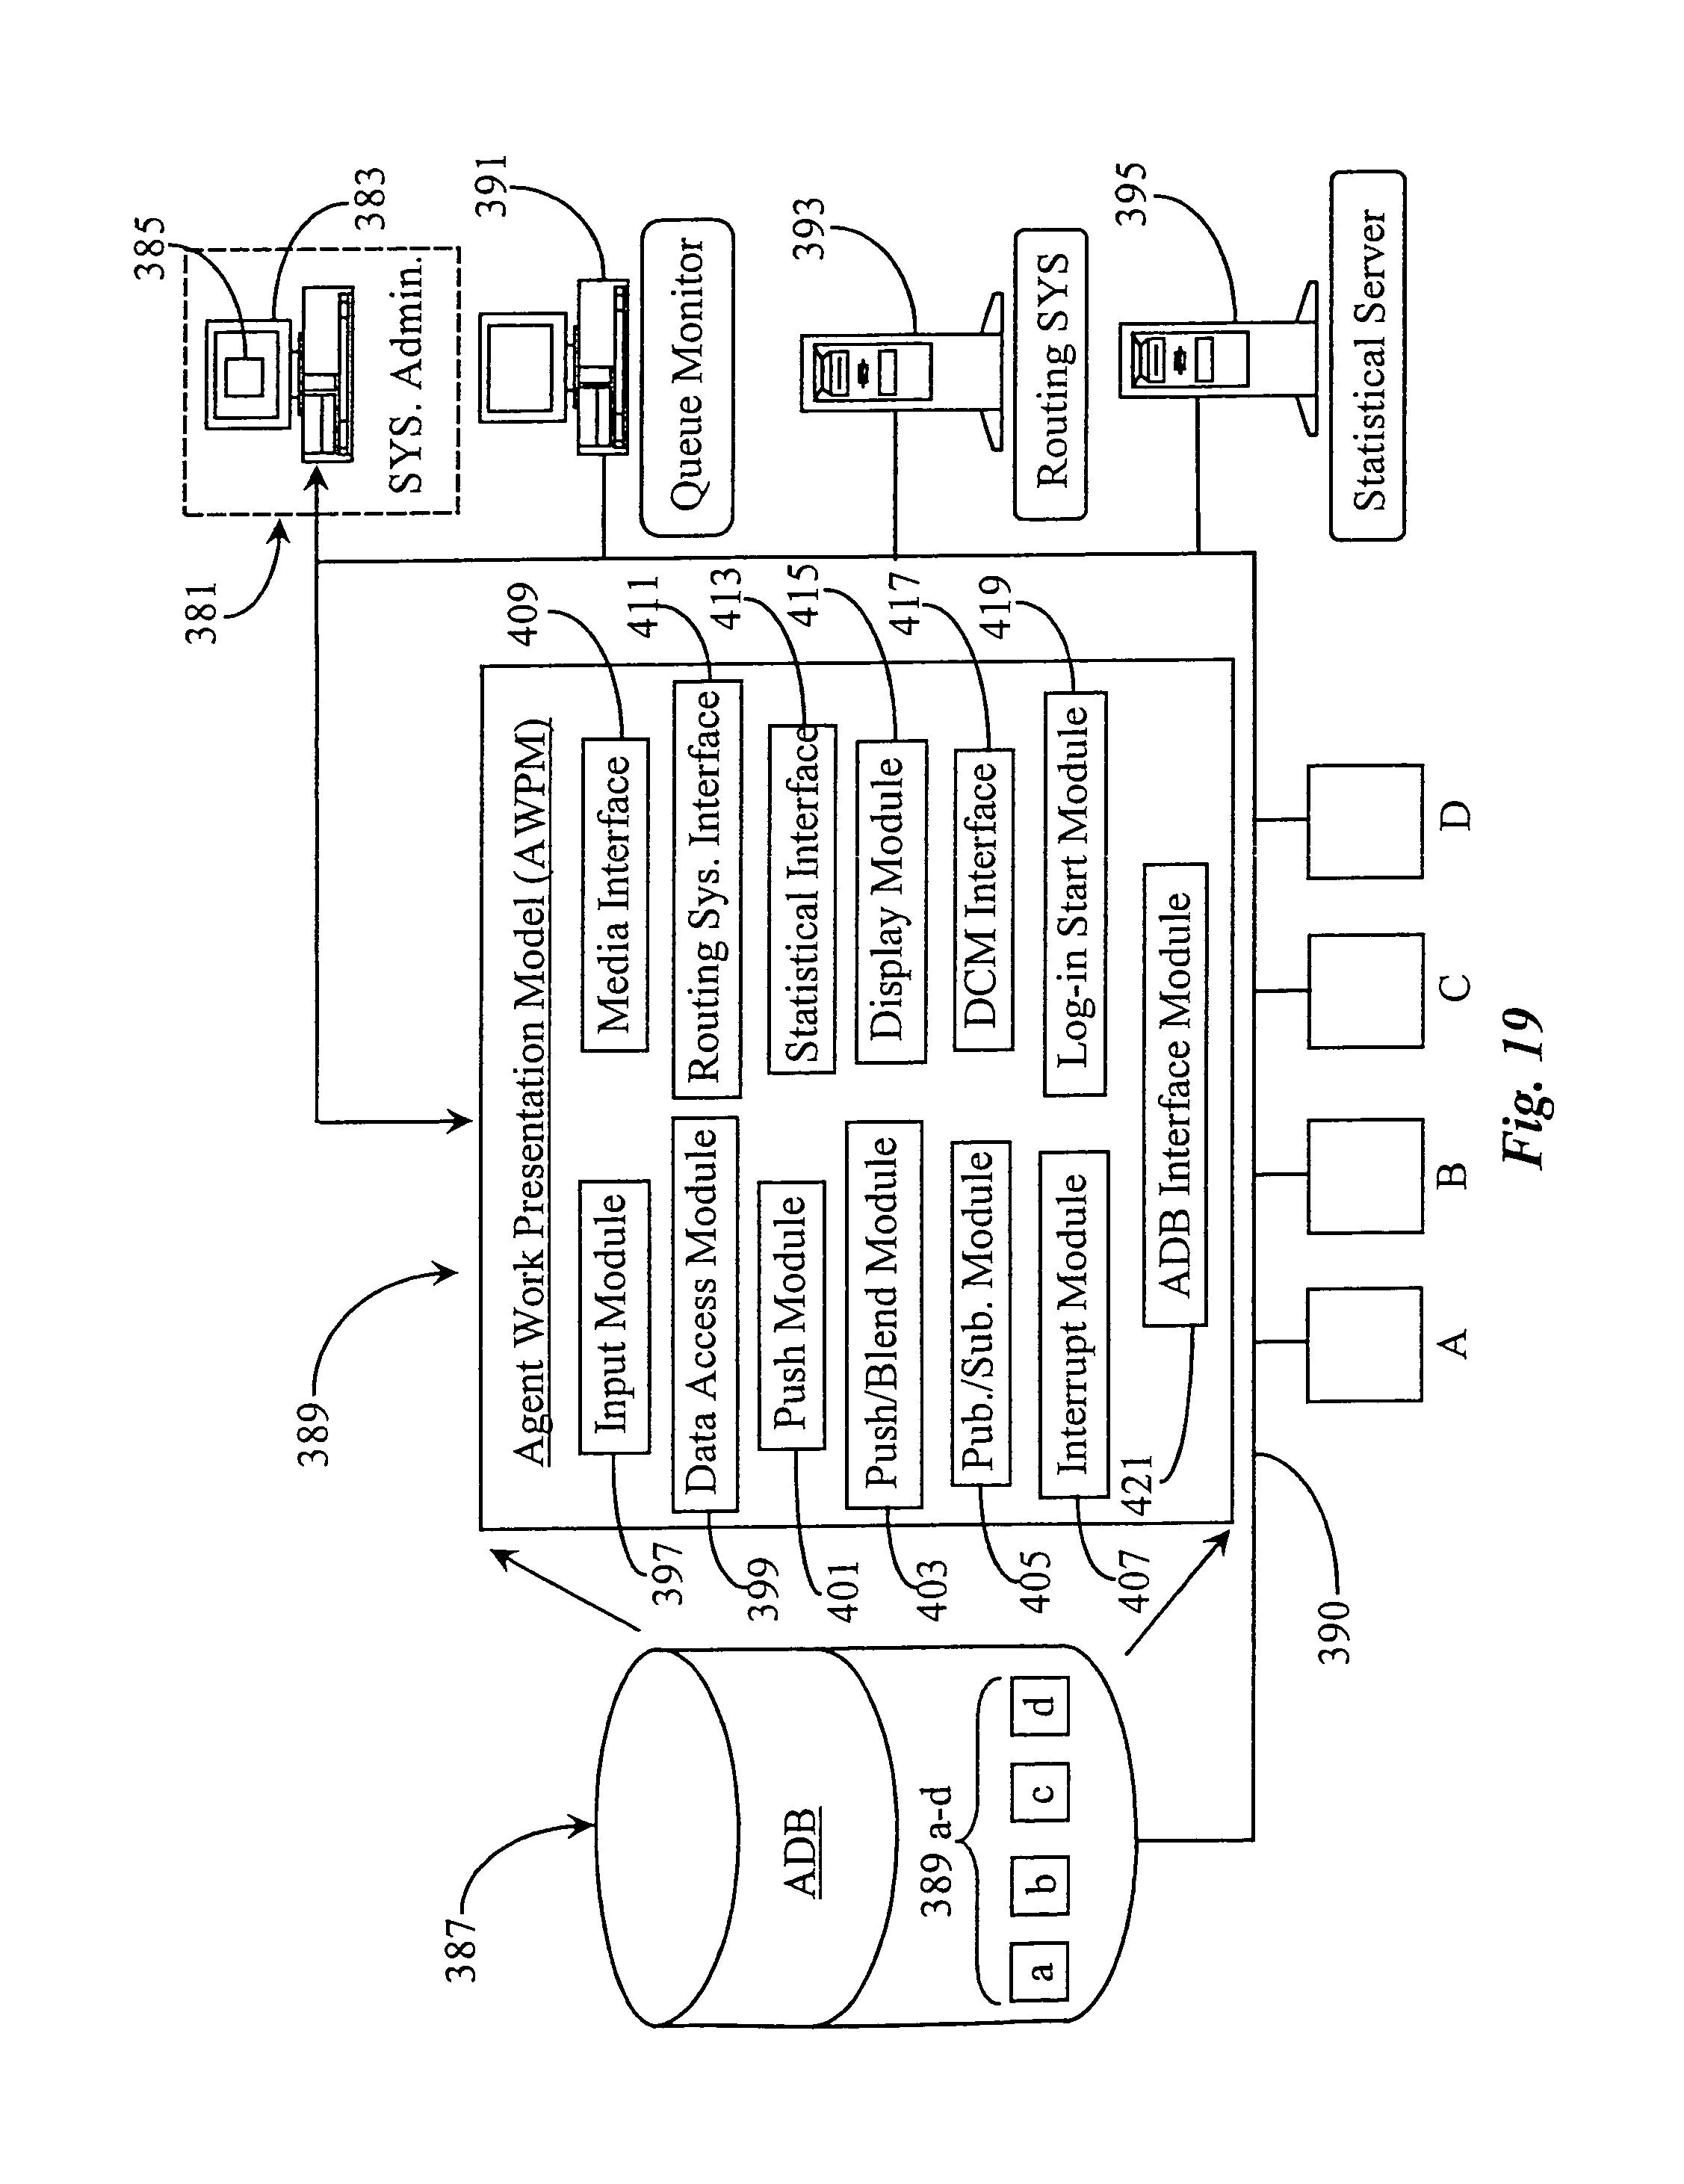 Patent US 8,971,216 B2